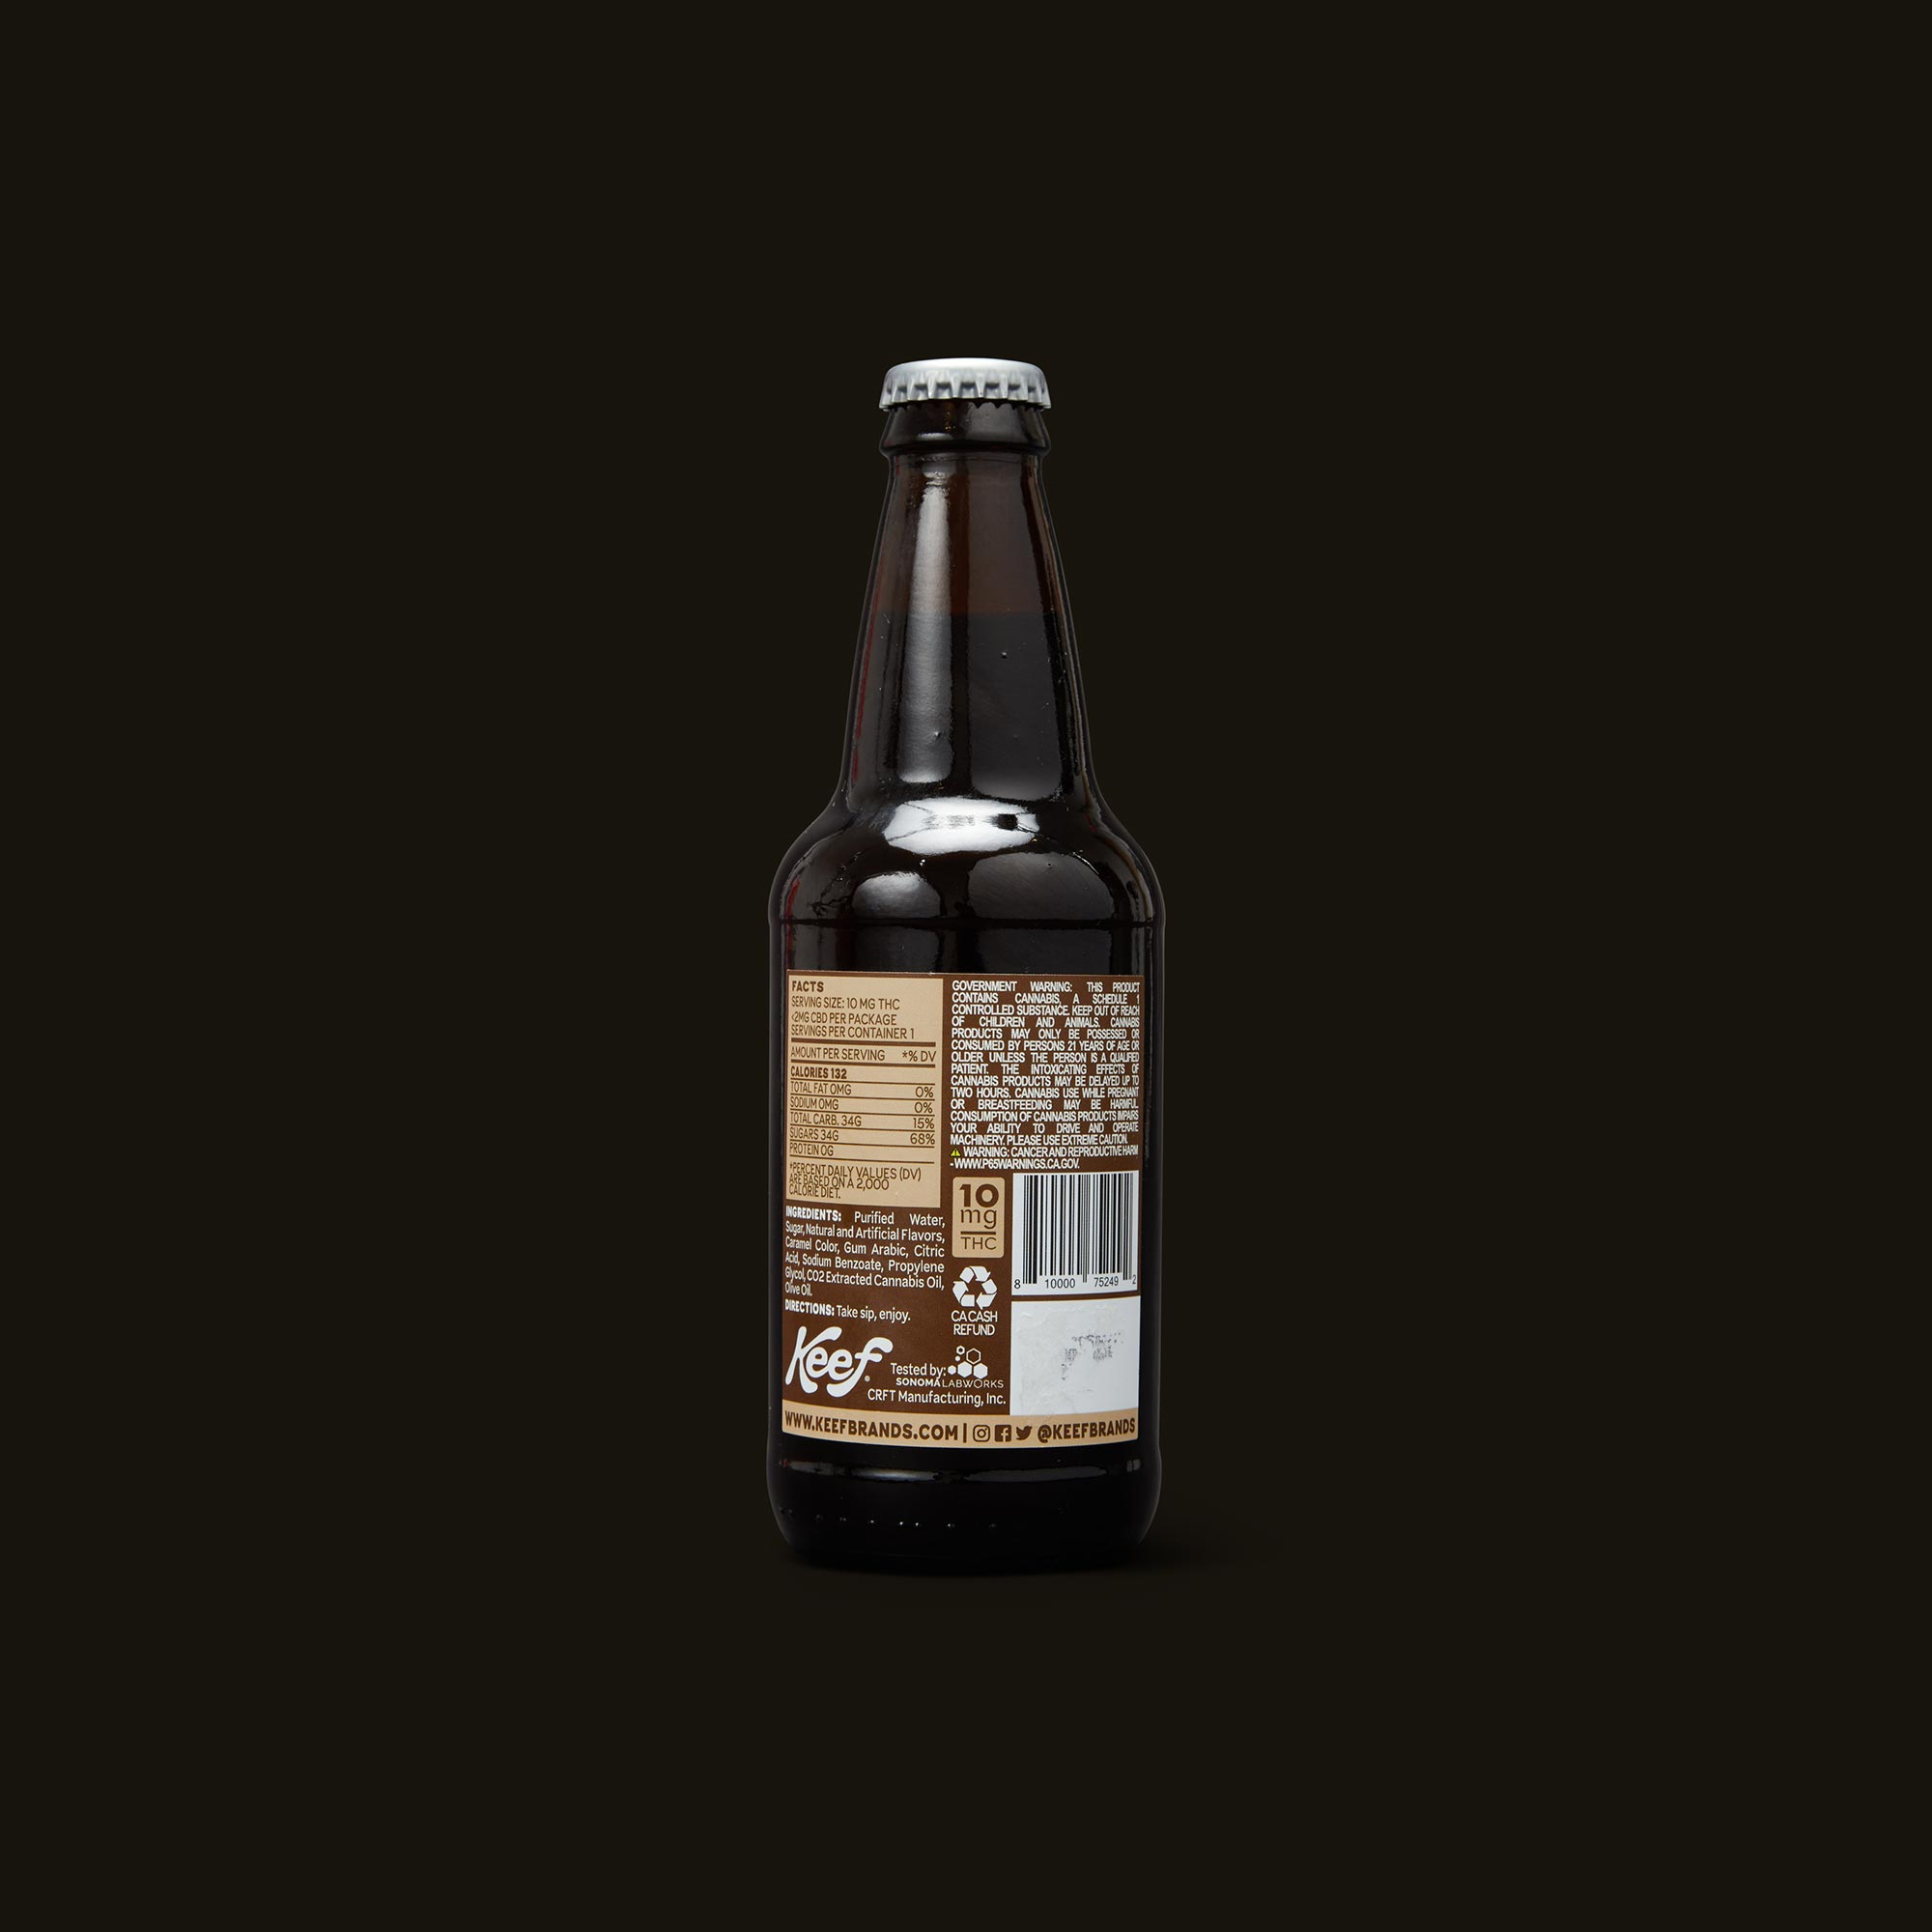 Keef Cola Bubba Kush Root Beer Ingredients